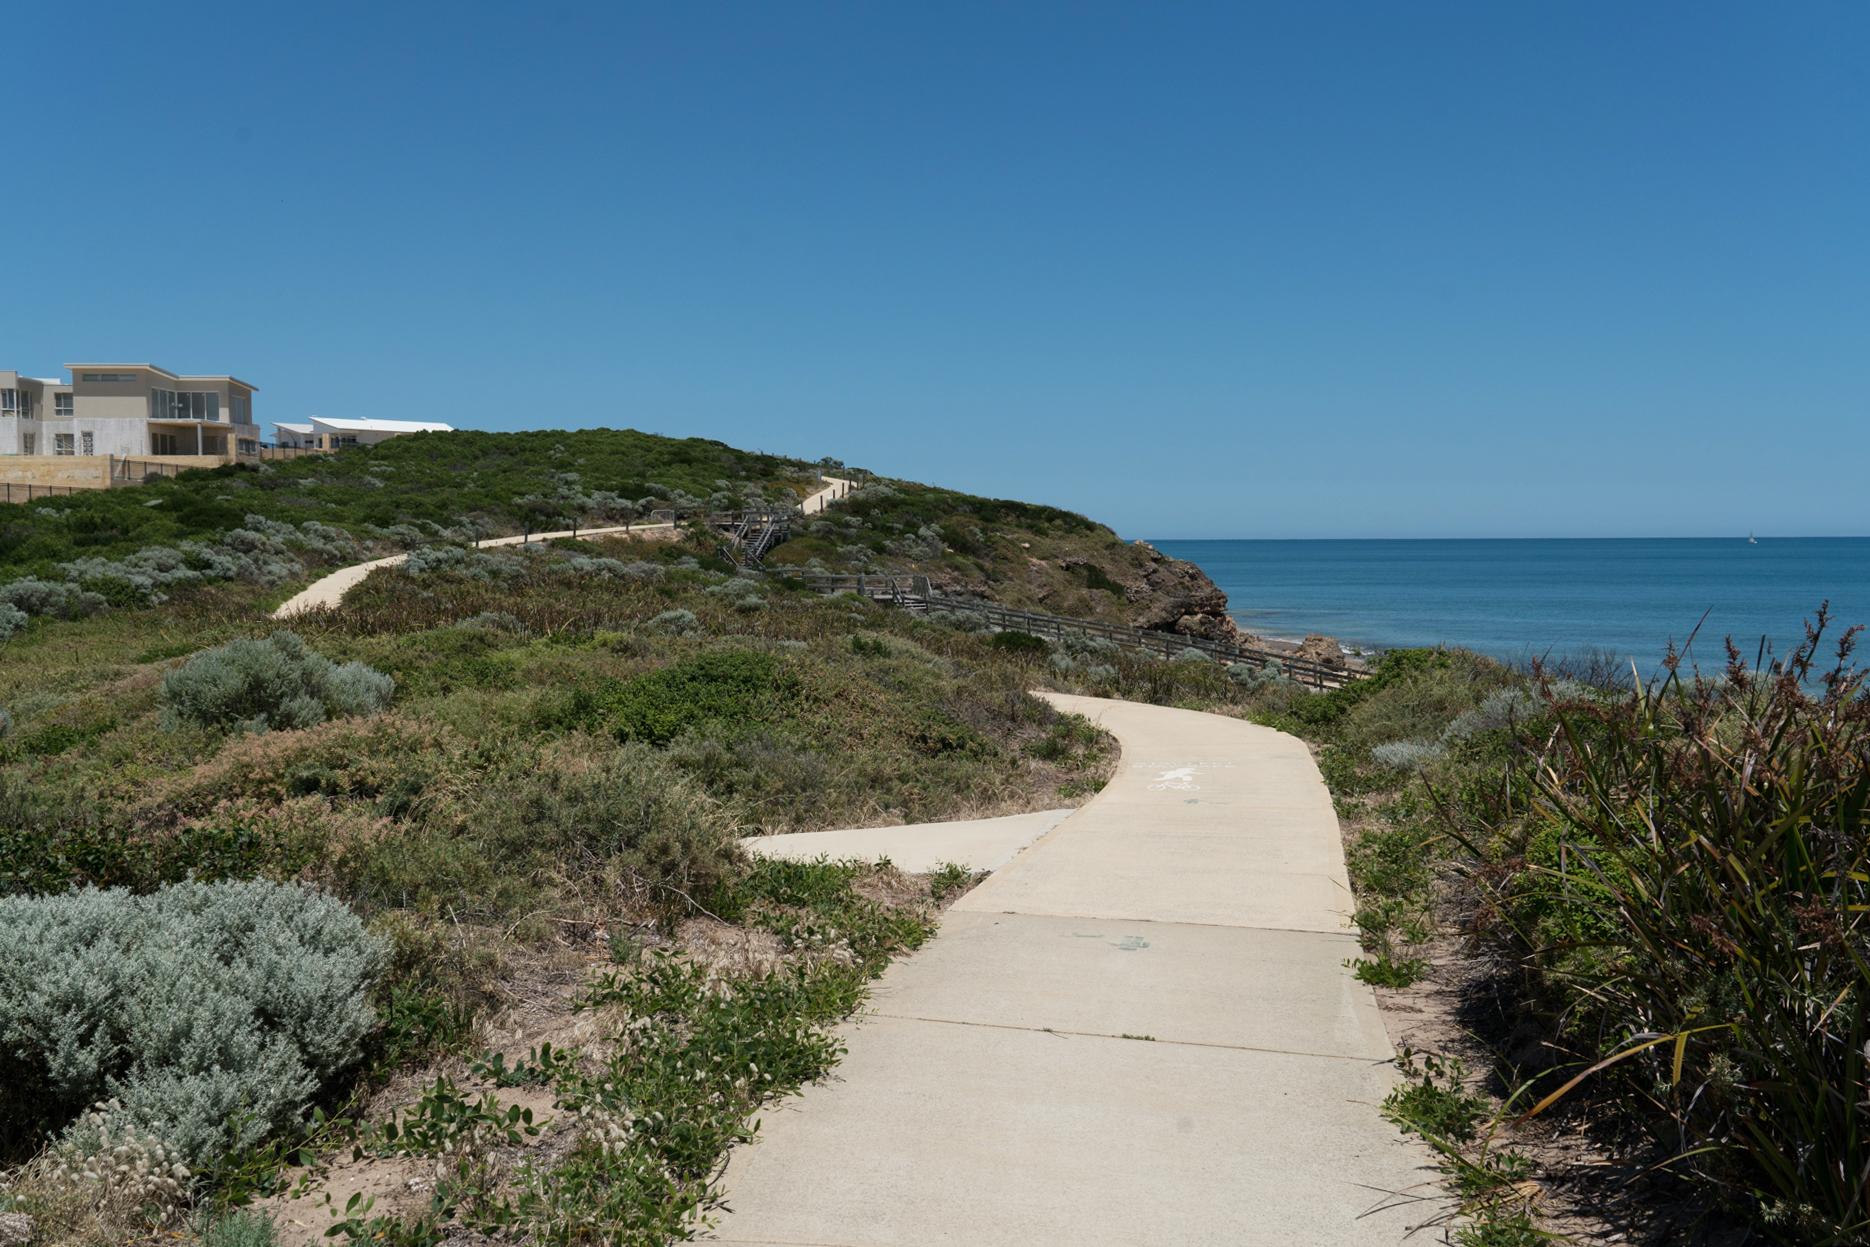 Plate 4: Views along the coastal path